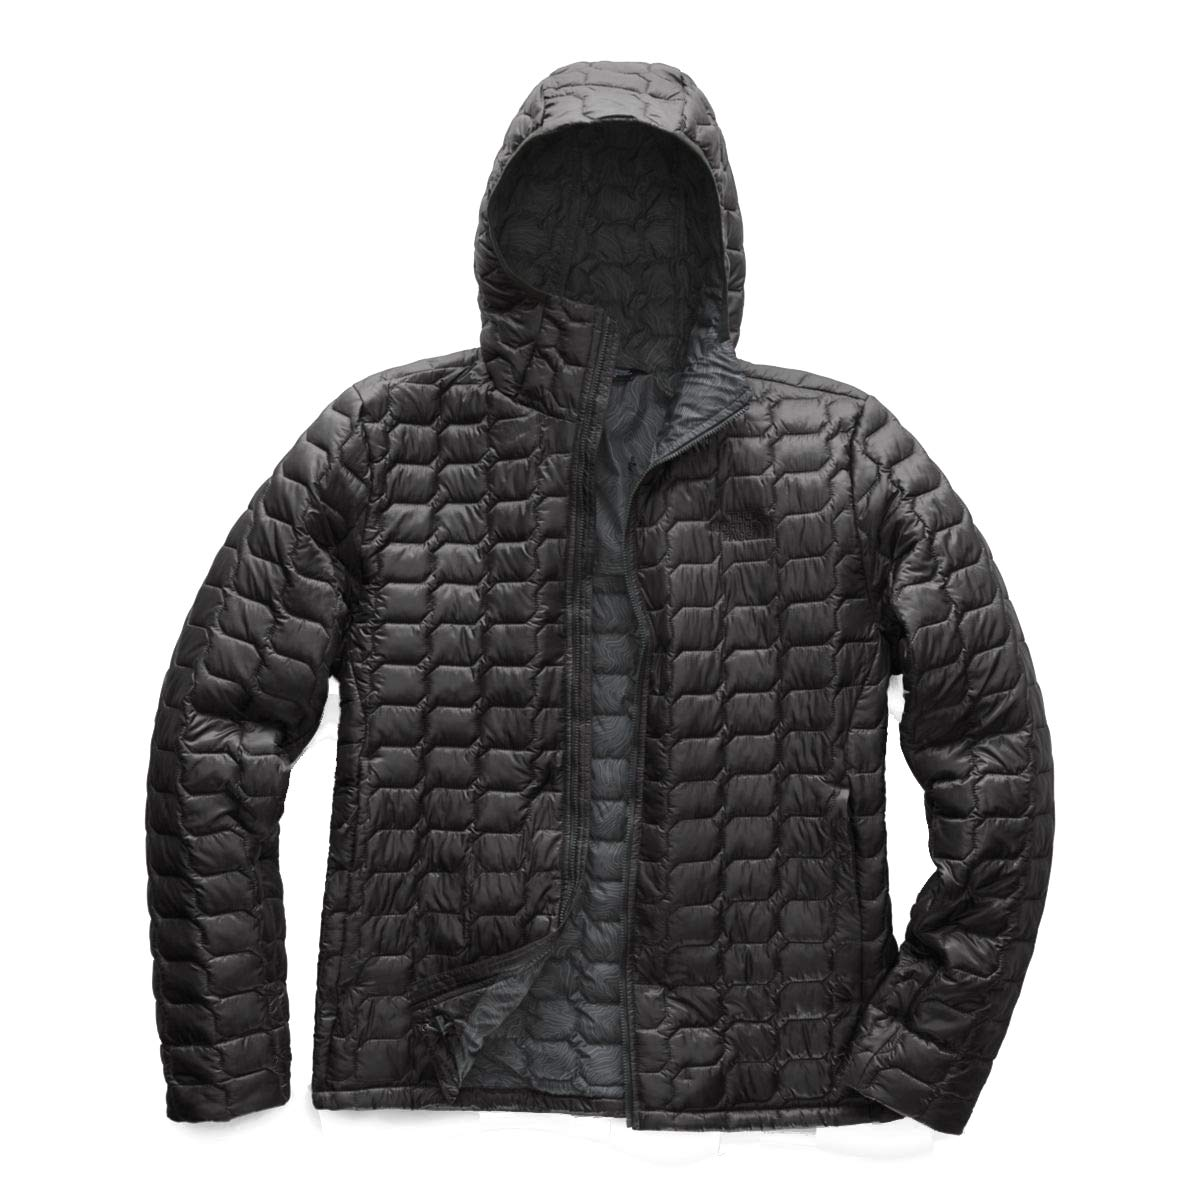 The North Face Men's Thermoball Hoodie Asphalt Grey/Asphalt Grey Small